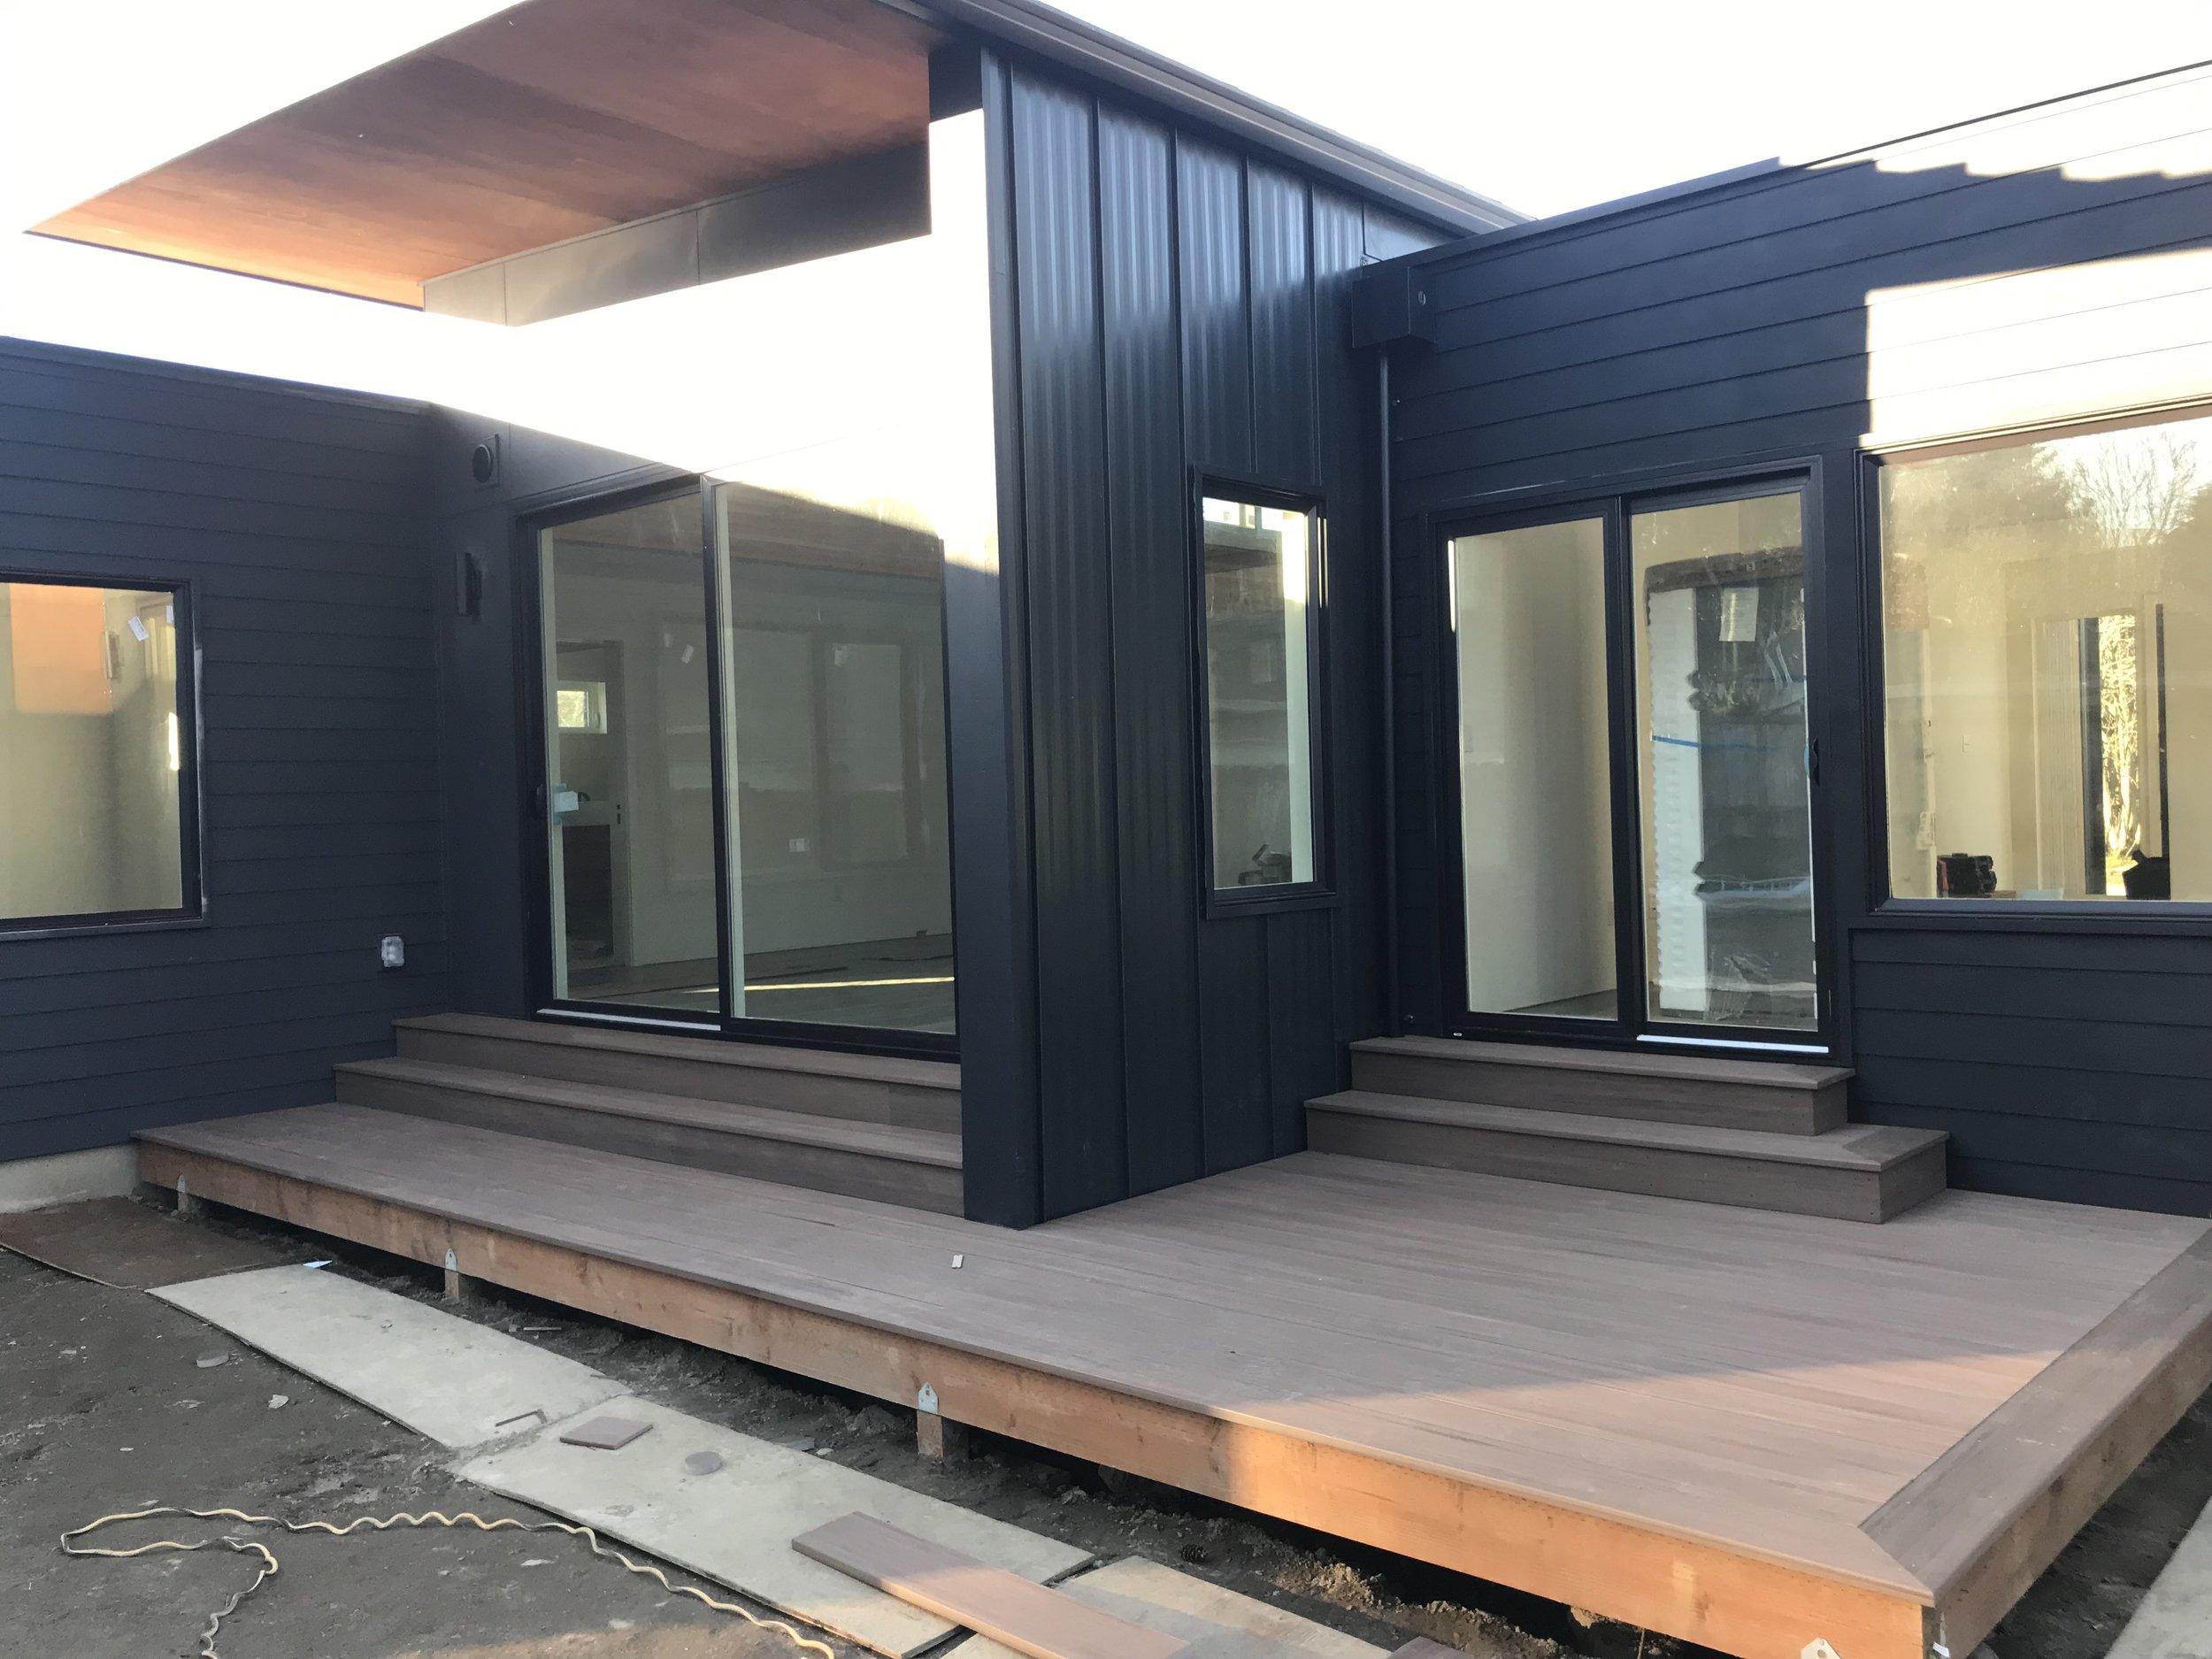 Wu-Taing Residence - A contemporary three-module prefab in Renton, WA.